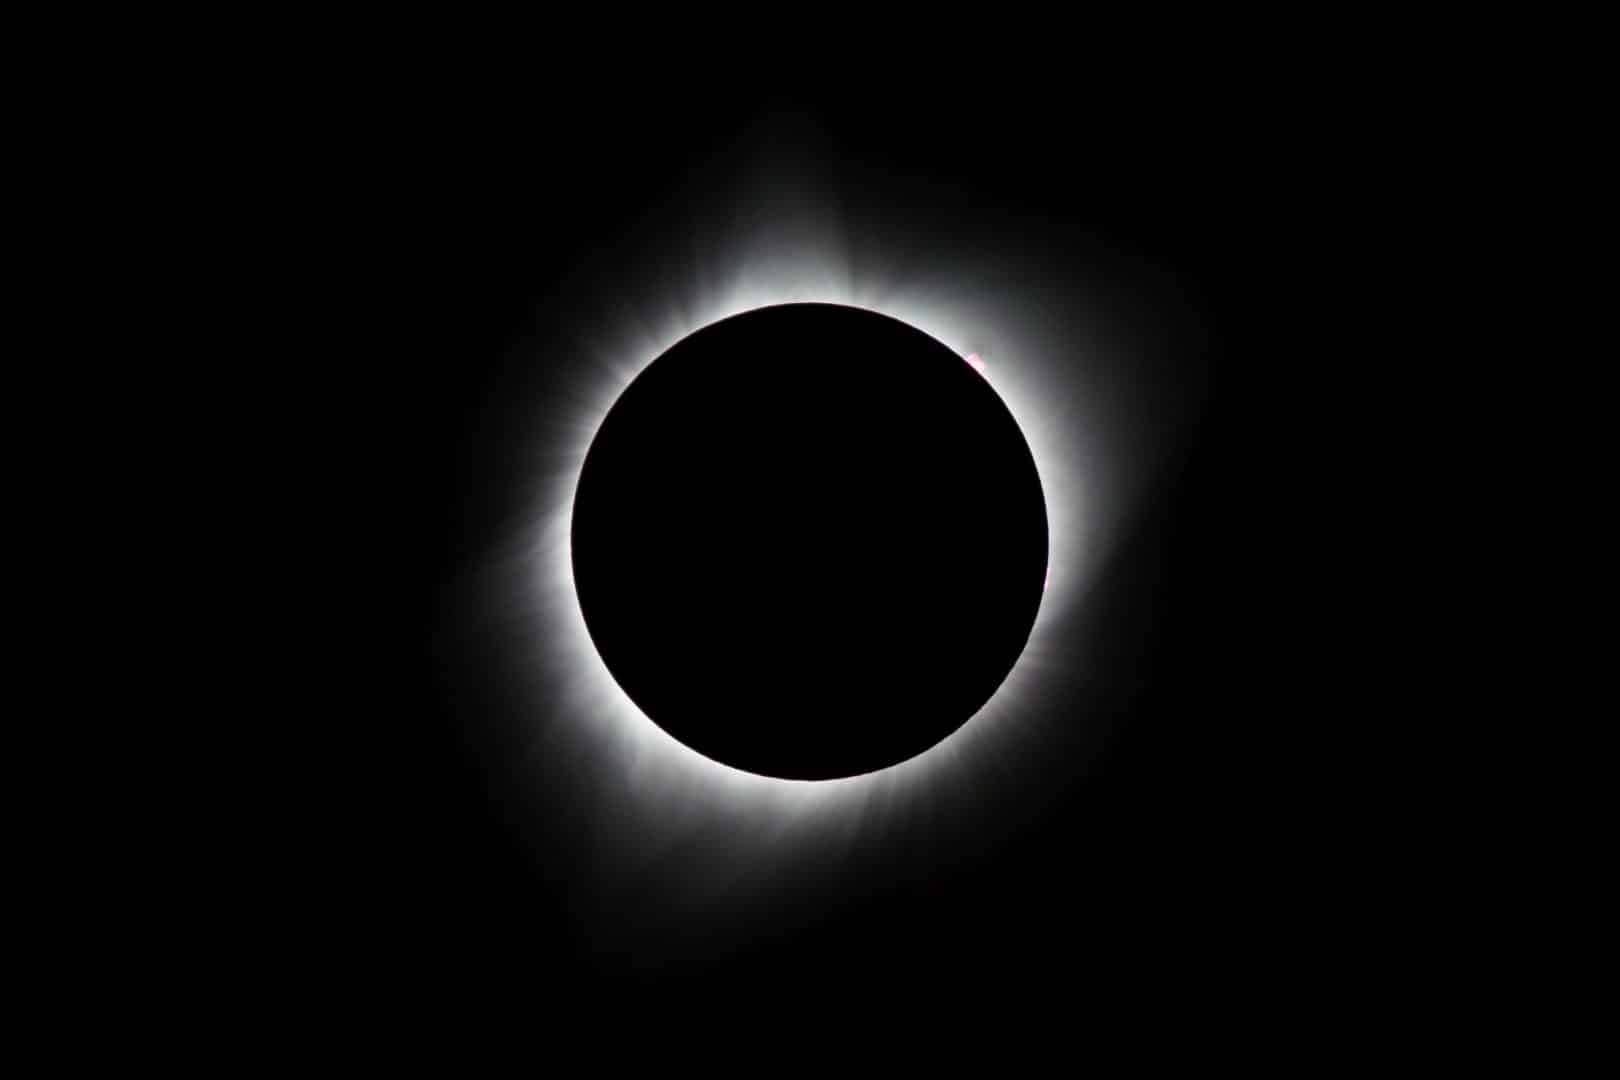 Onde e como observar o eclipse solar que acontece nessa terça-feira (02)